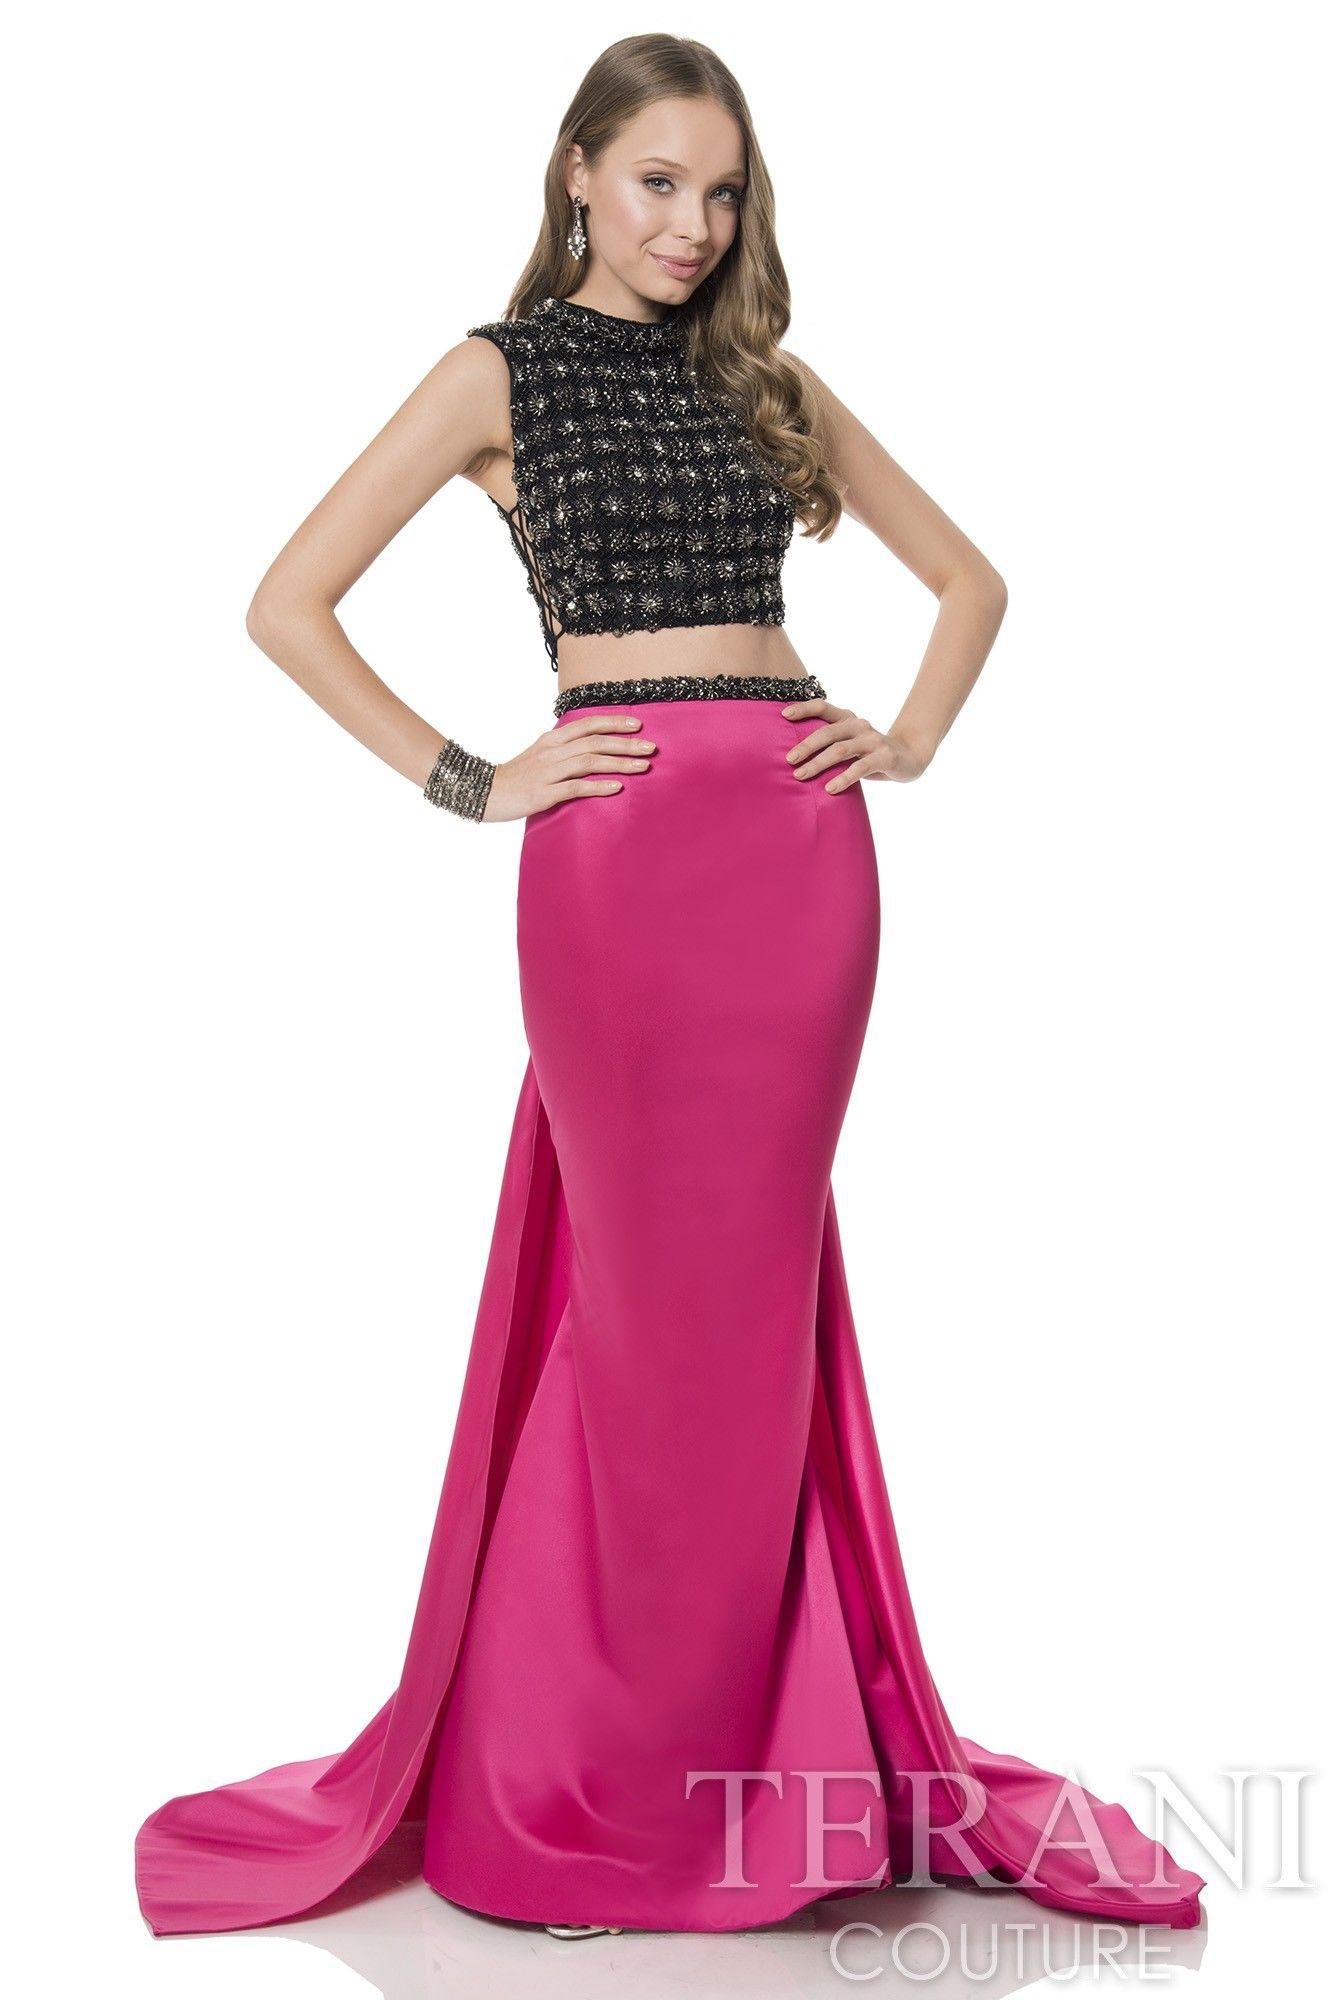 Terani Prom 2016 Style 1611P1367 $369.99 Terani Prom 2016